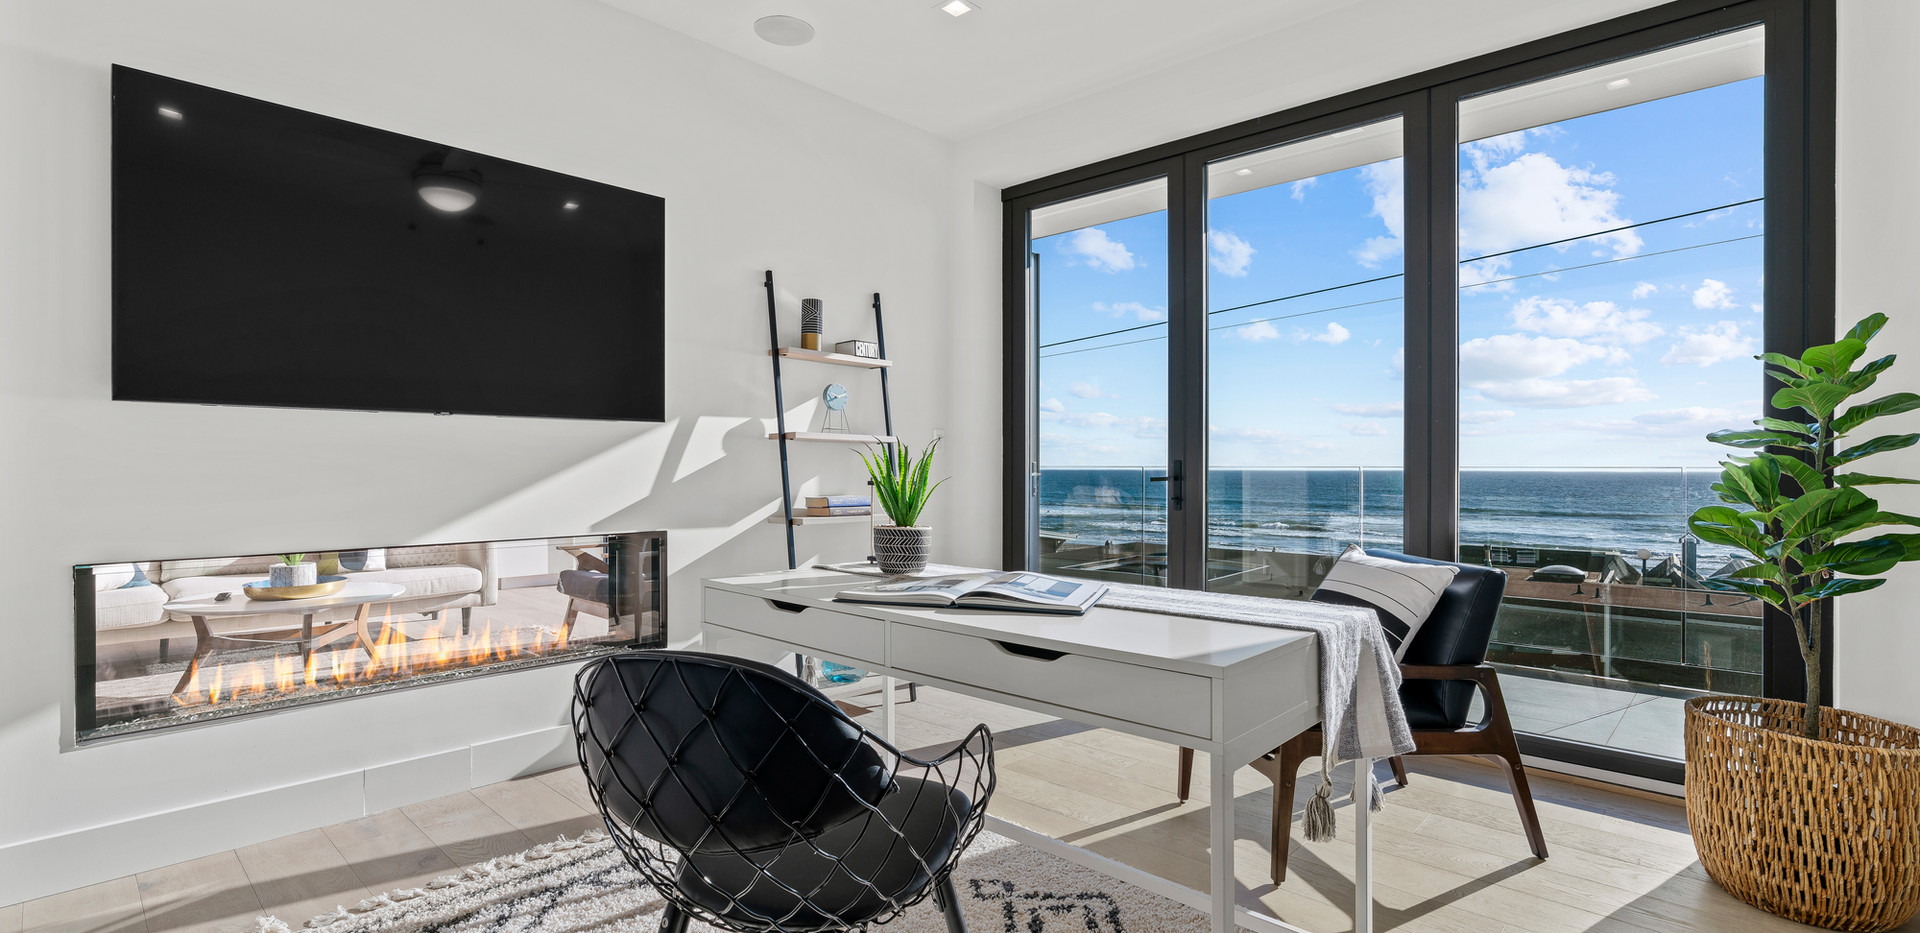 Second Floor Penthouse - Executive Office